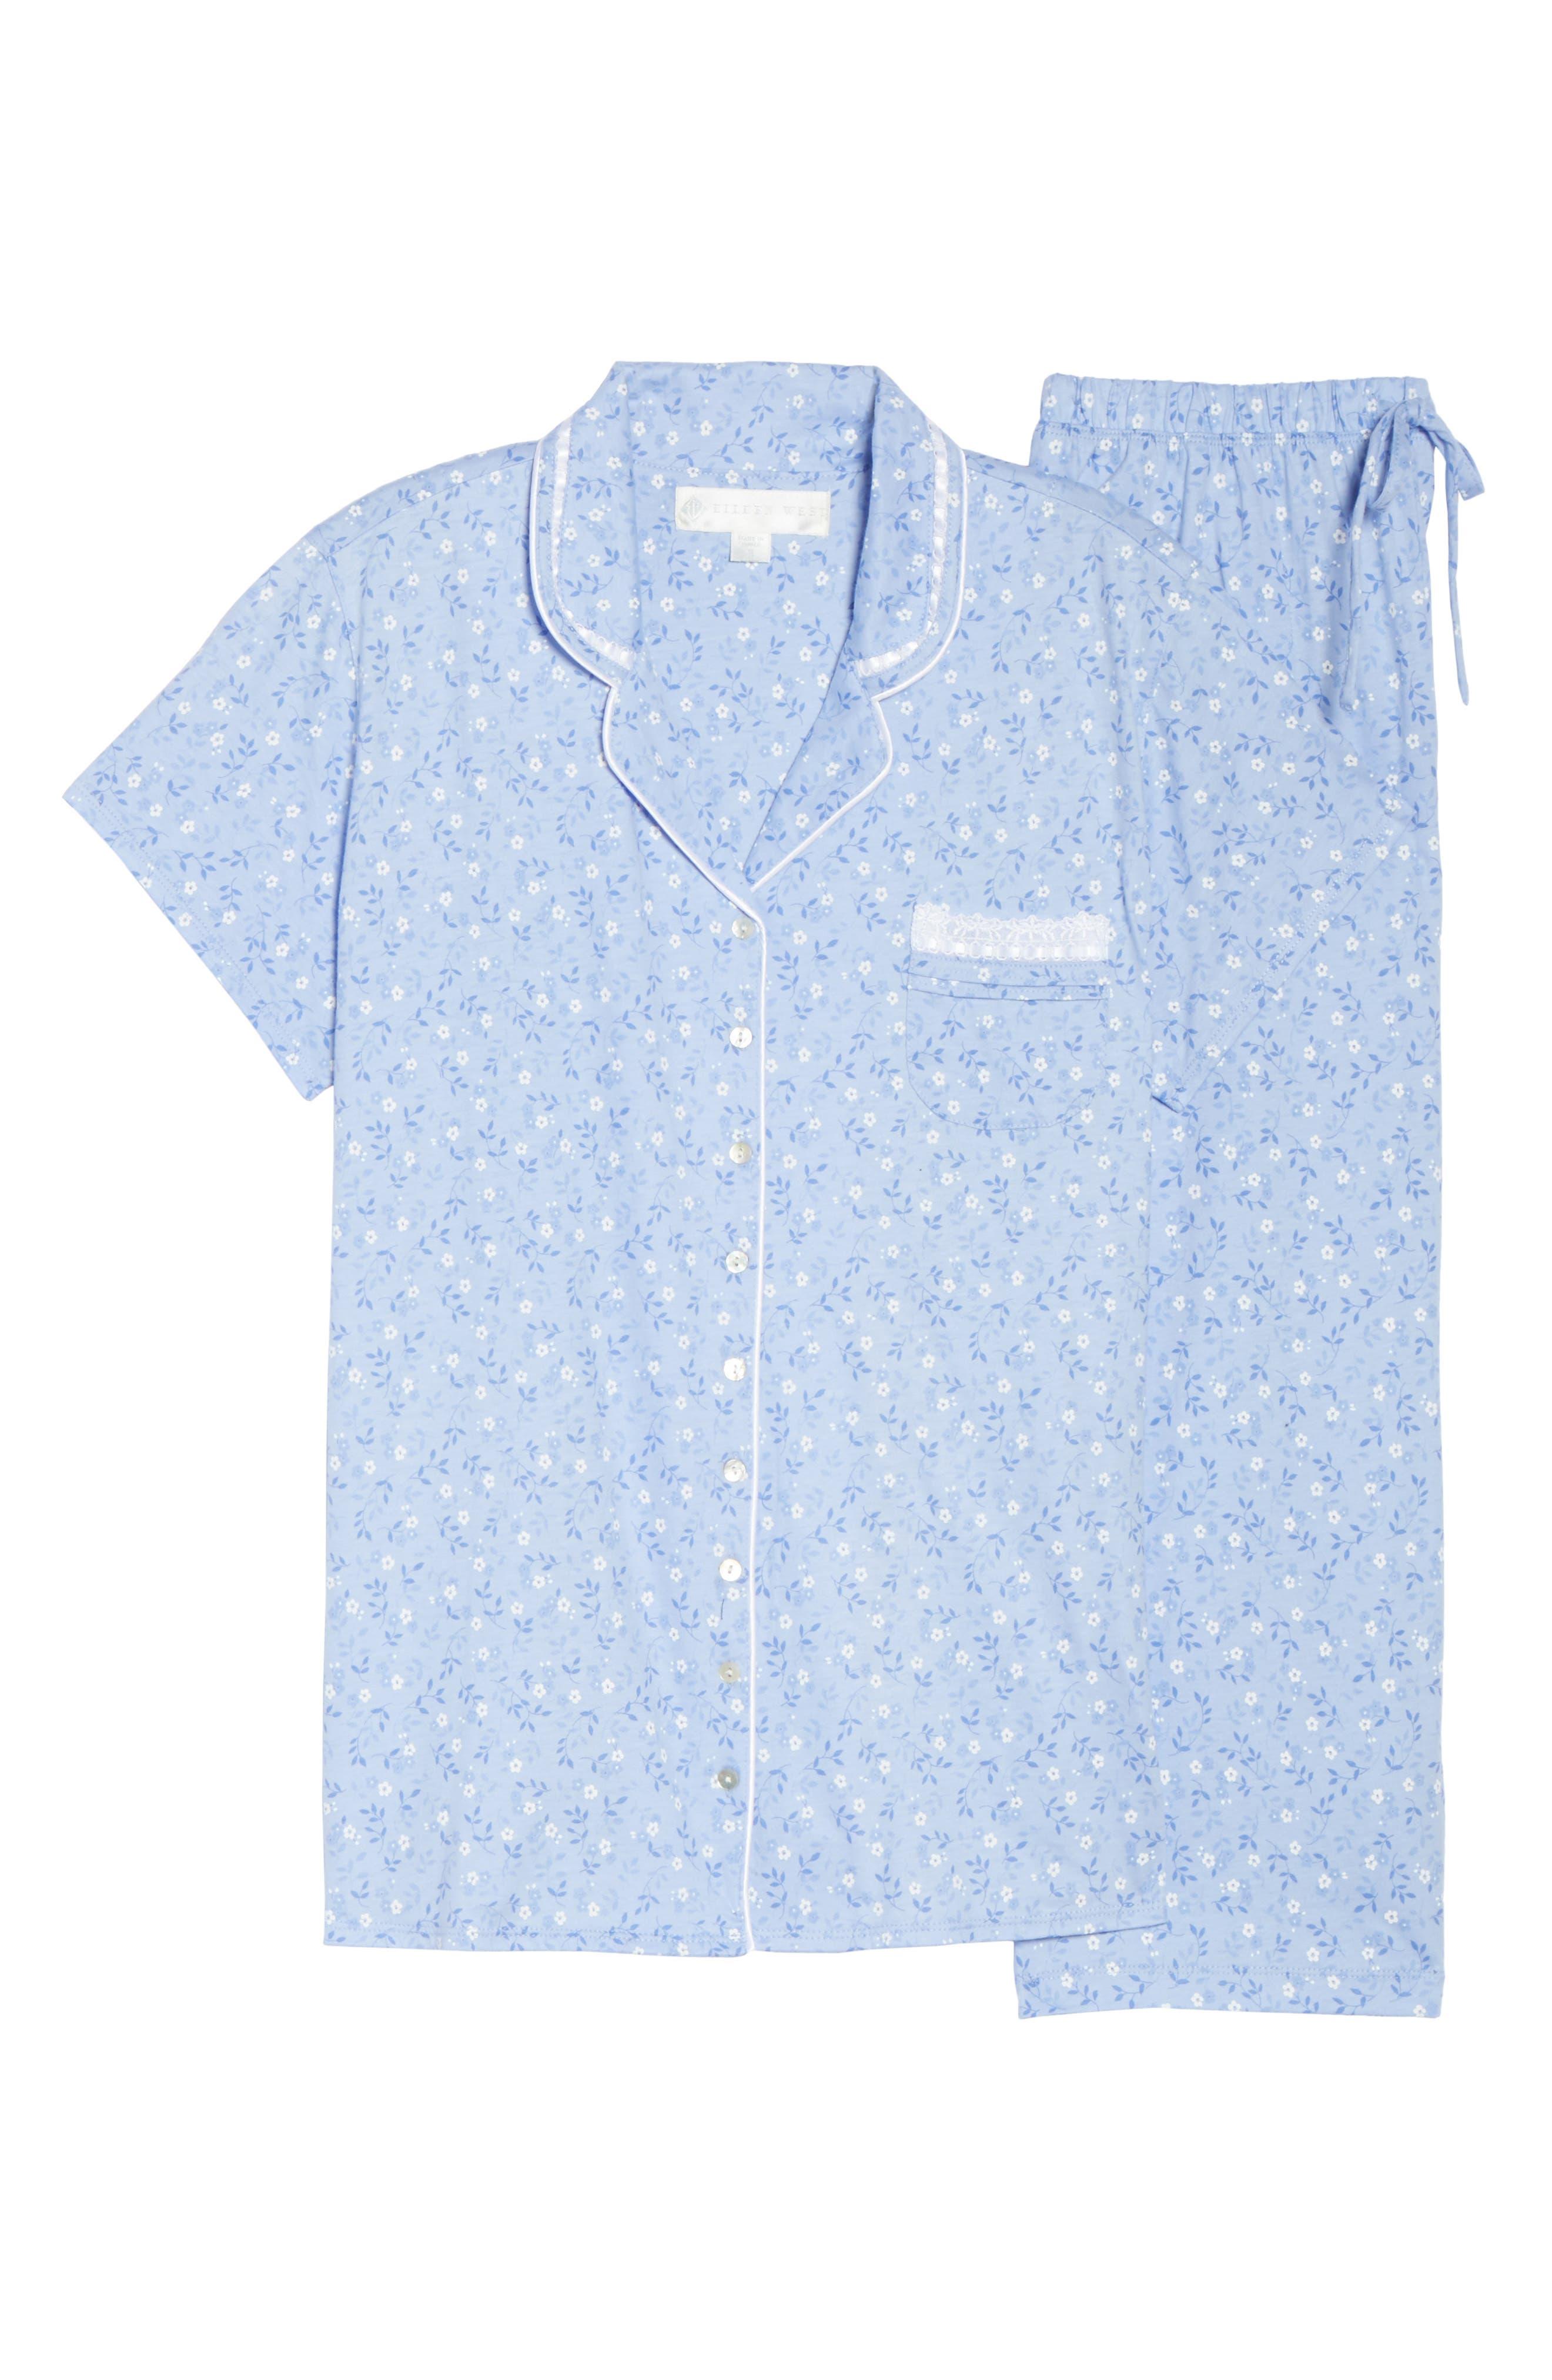 Jersey Pajamas,                             Alternate thumbnail 6, color,                             400